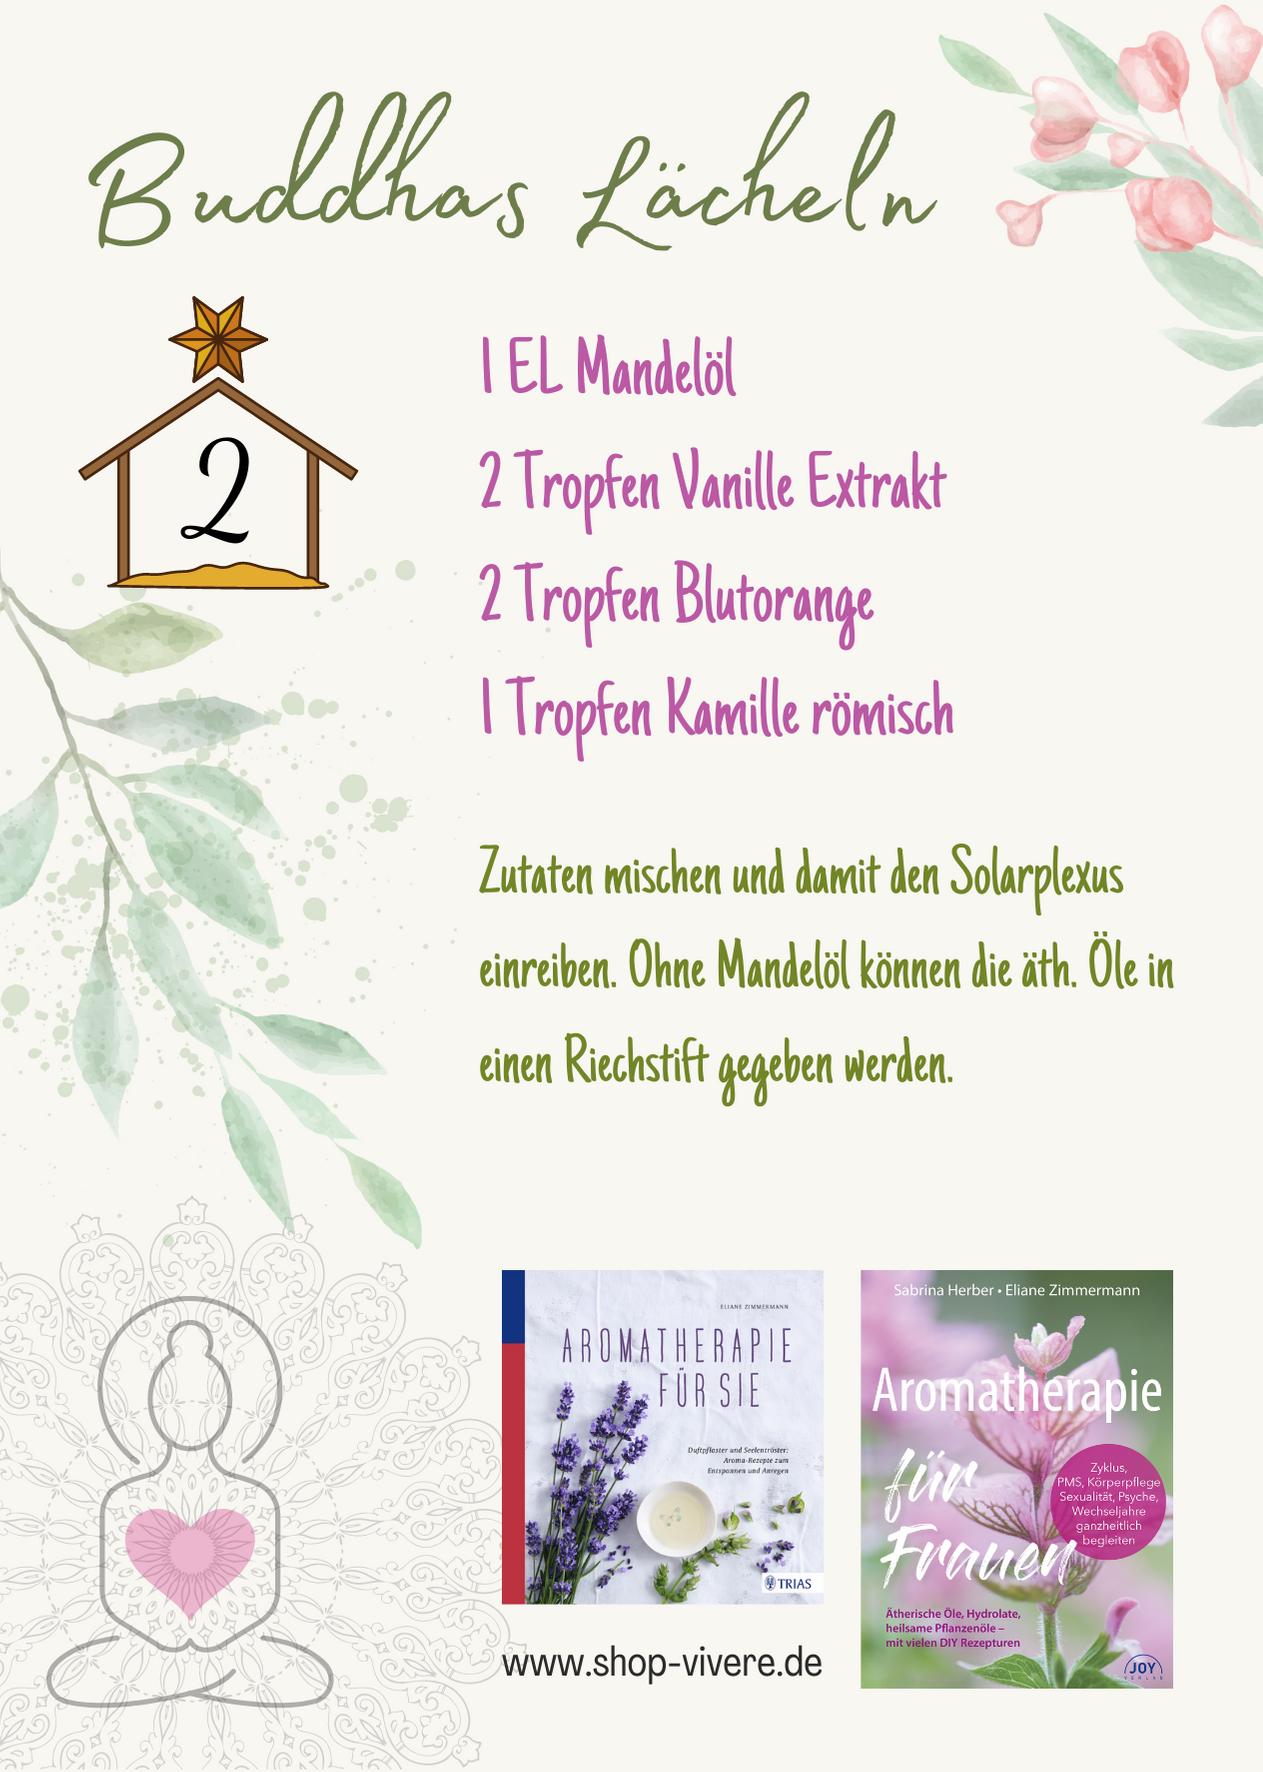 Adventskalender - Aromatherapie 2. Dezember